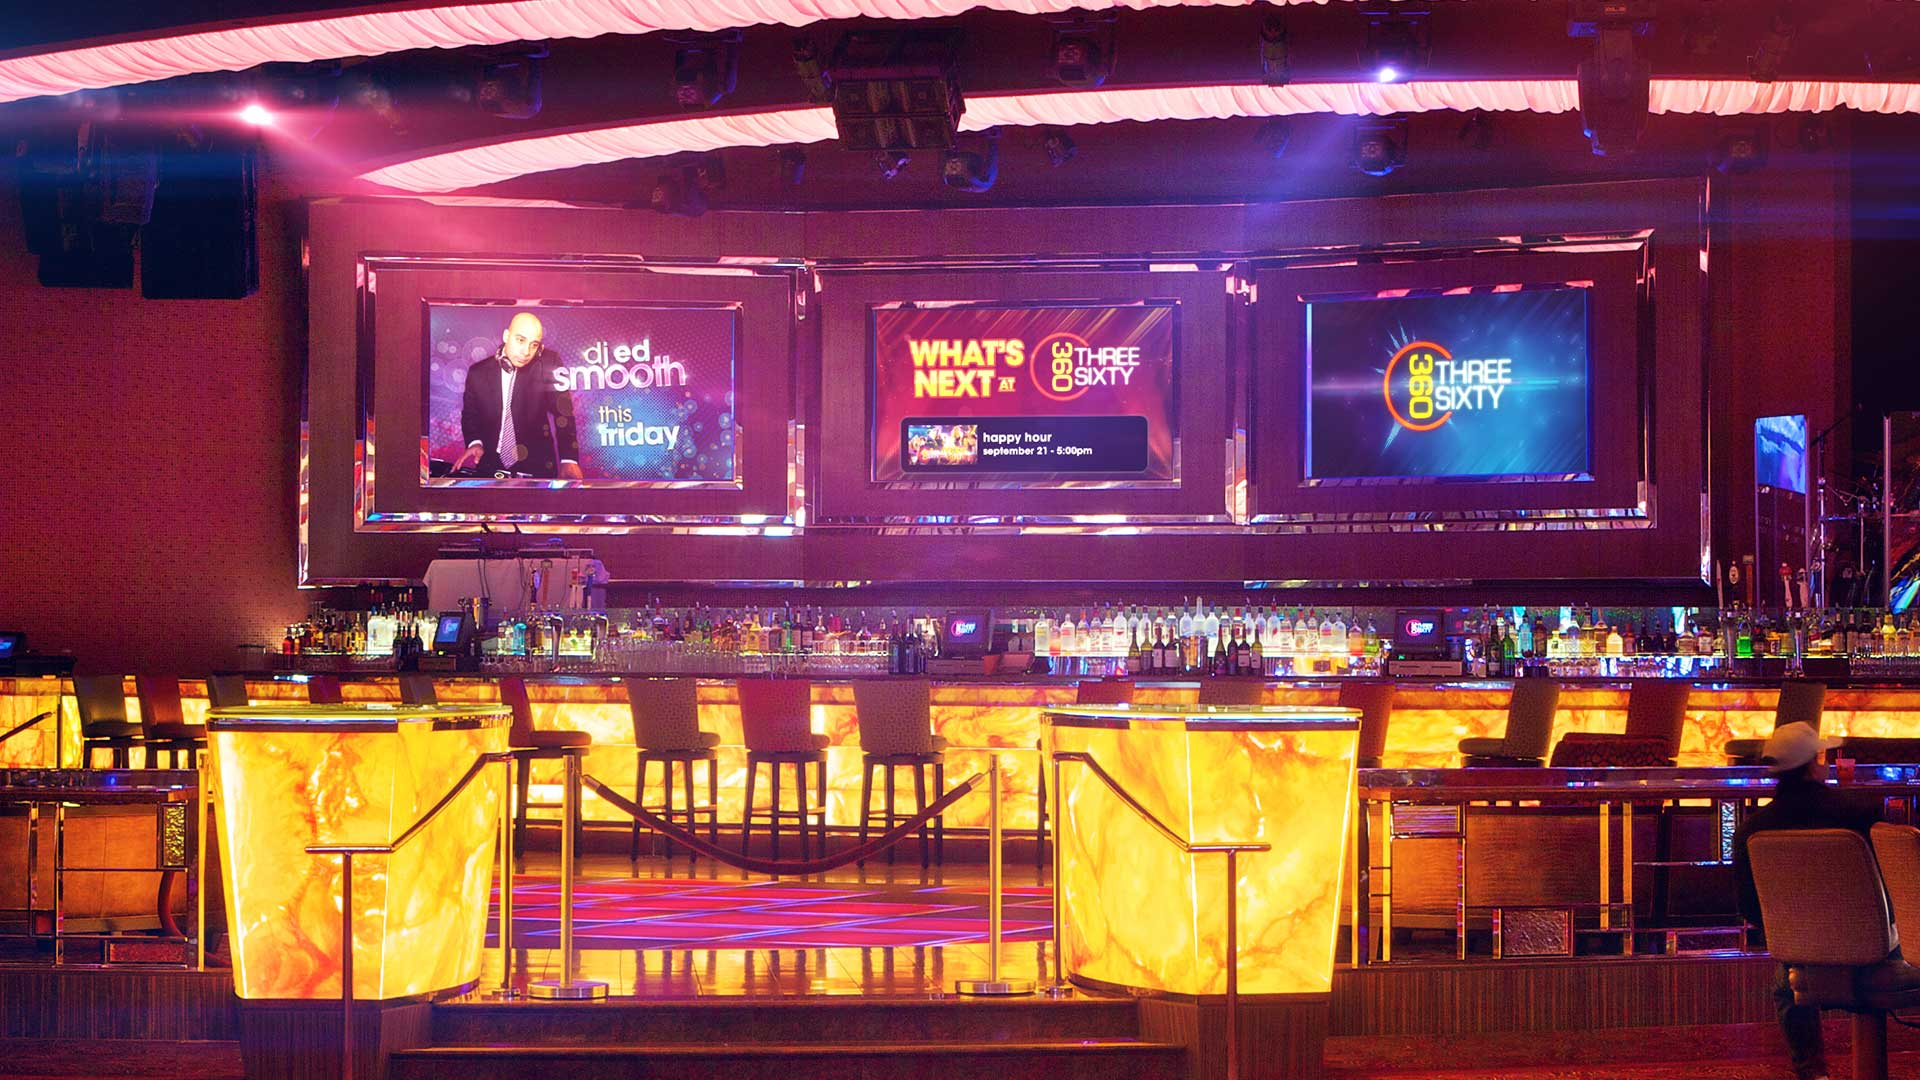 Alea casino leeds poker schedule